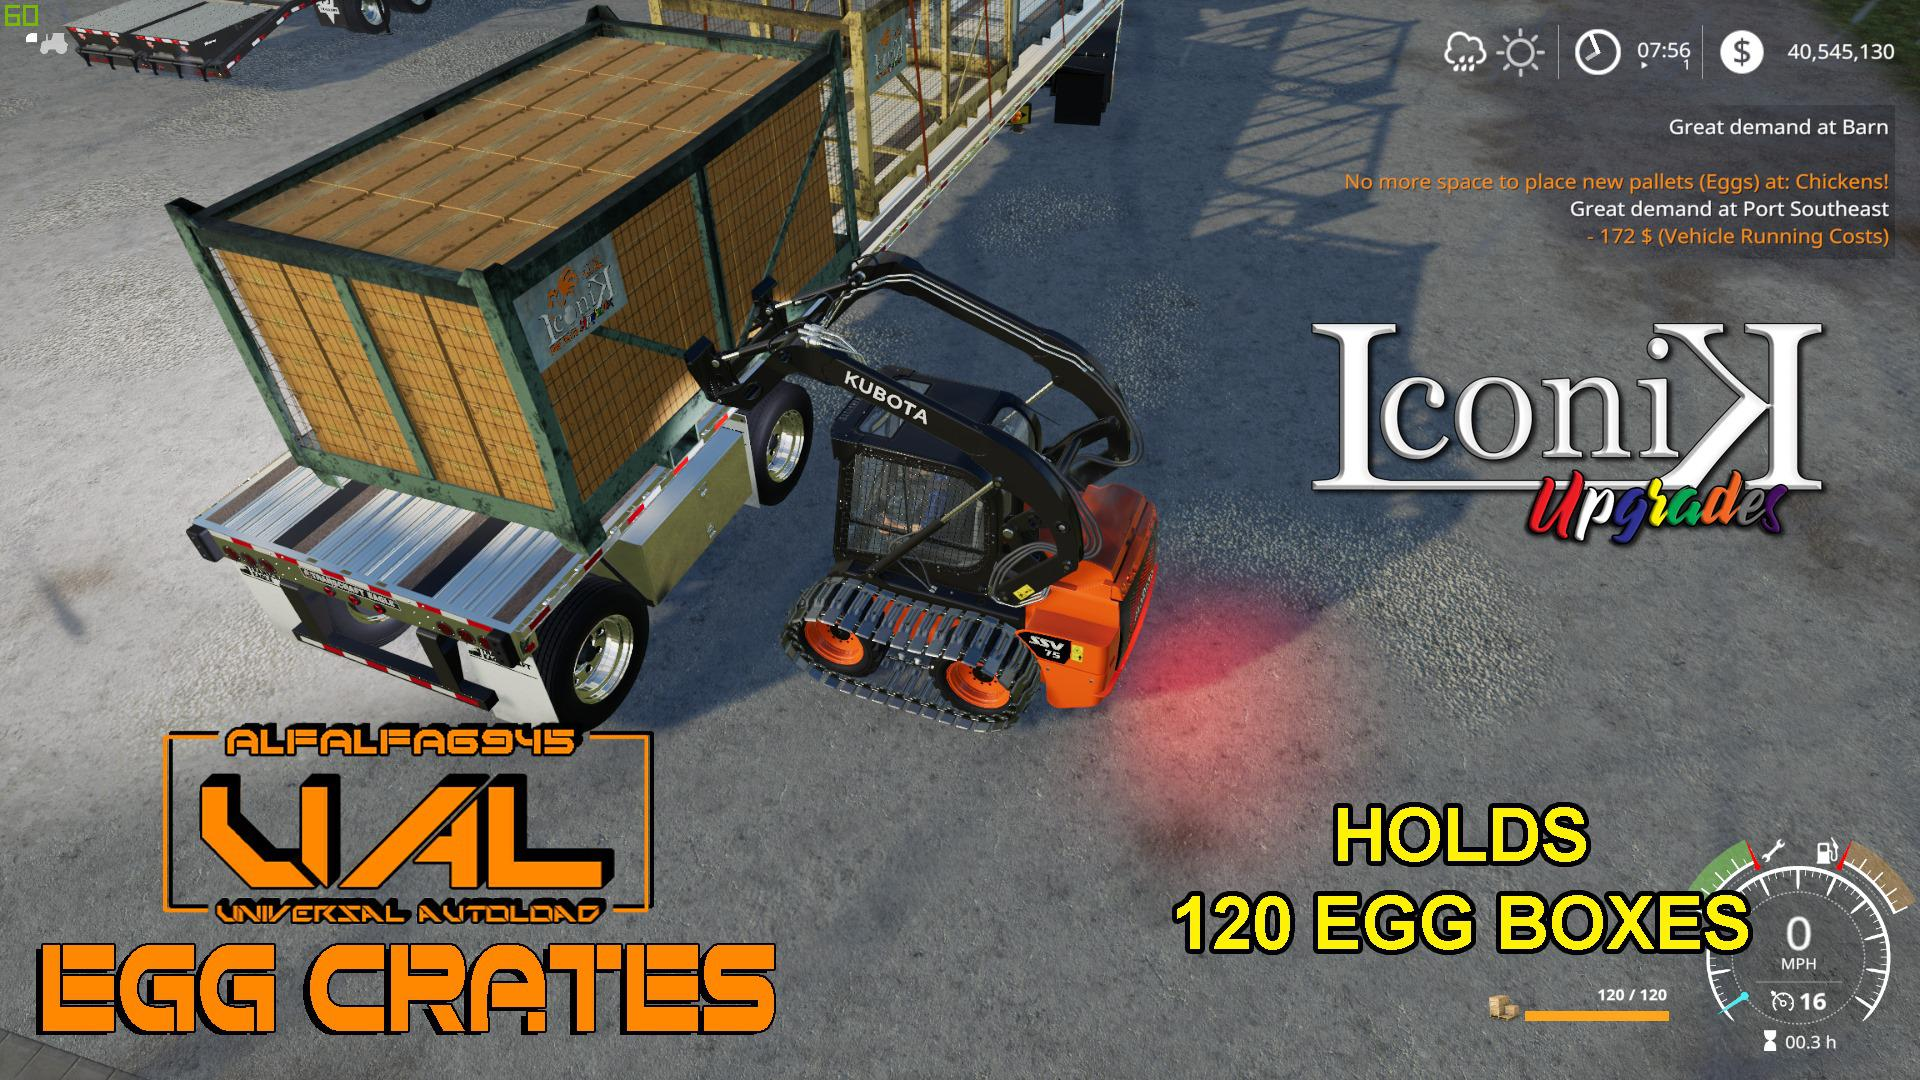 iconik ual egg crates v1 0 fs19